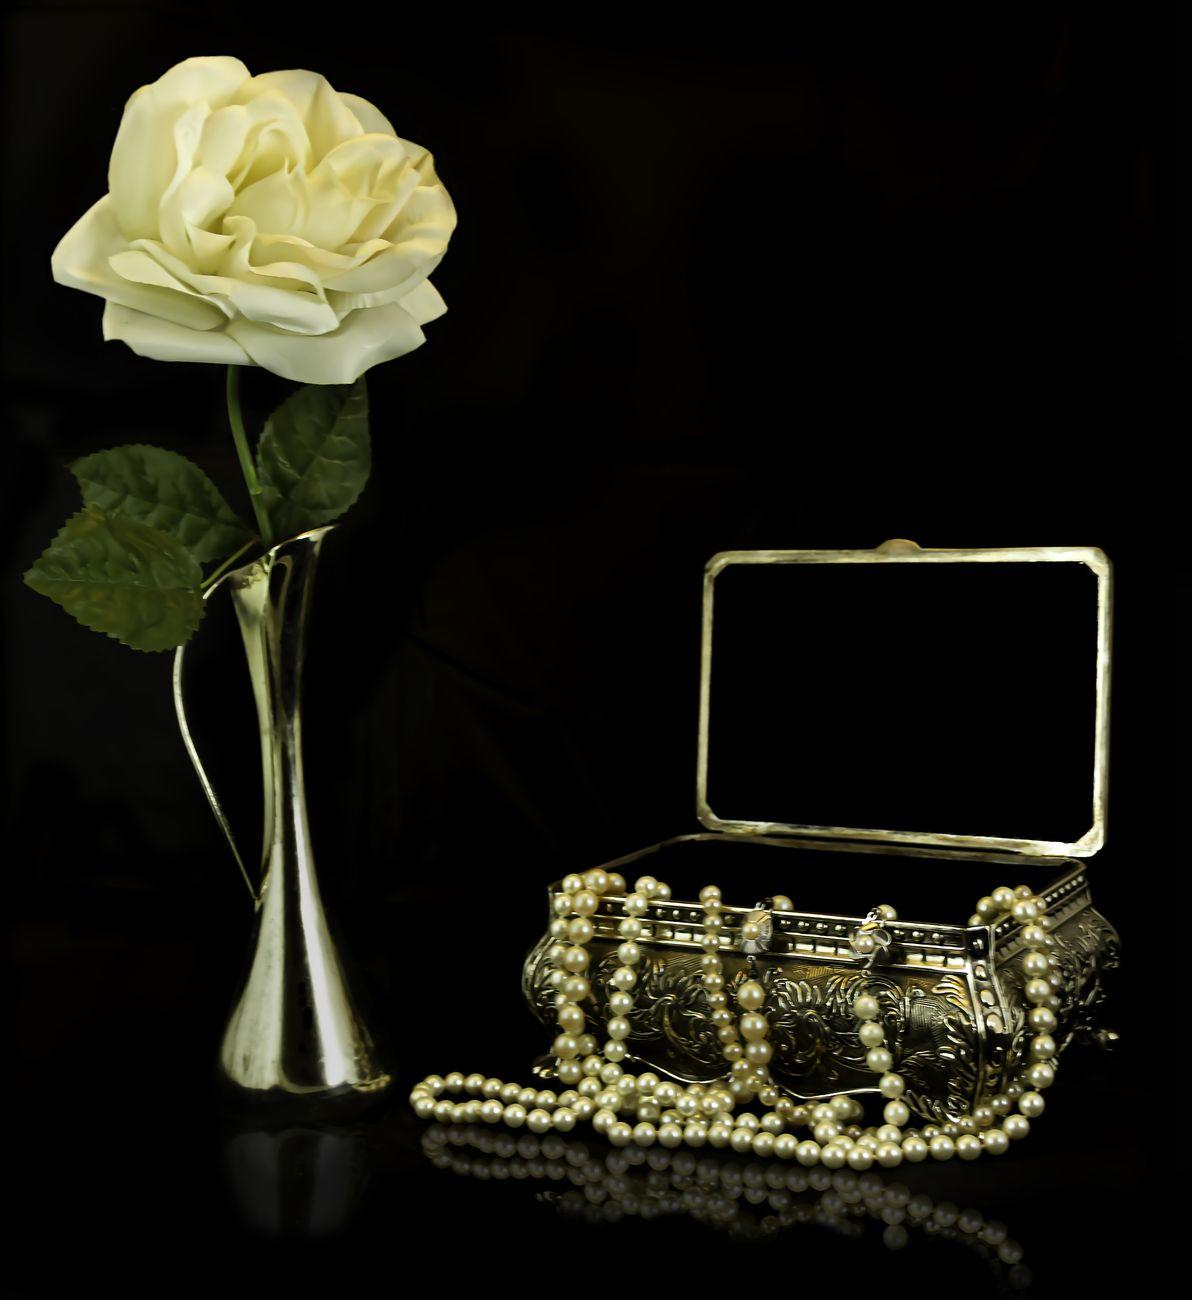 still life rose and pearls